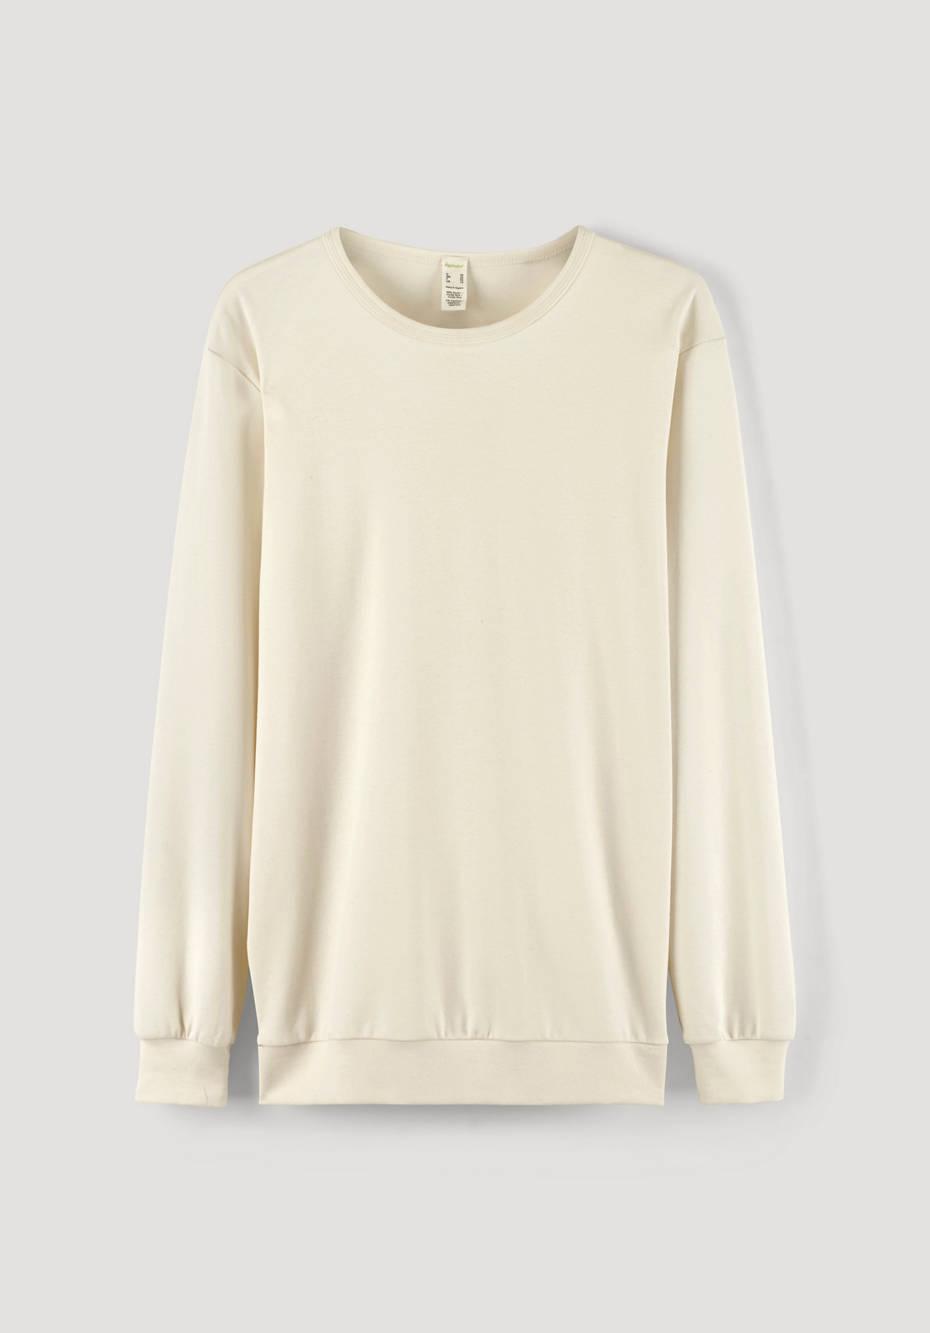 Pyjama PureNATURE aus reiner Bio-Baumwolle